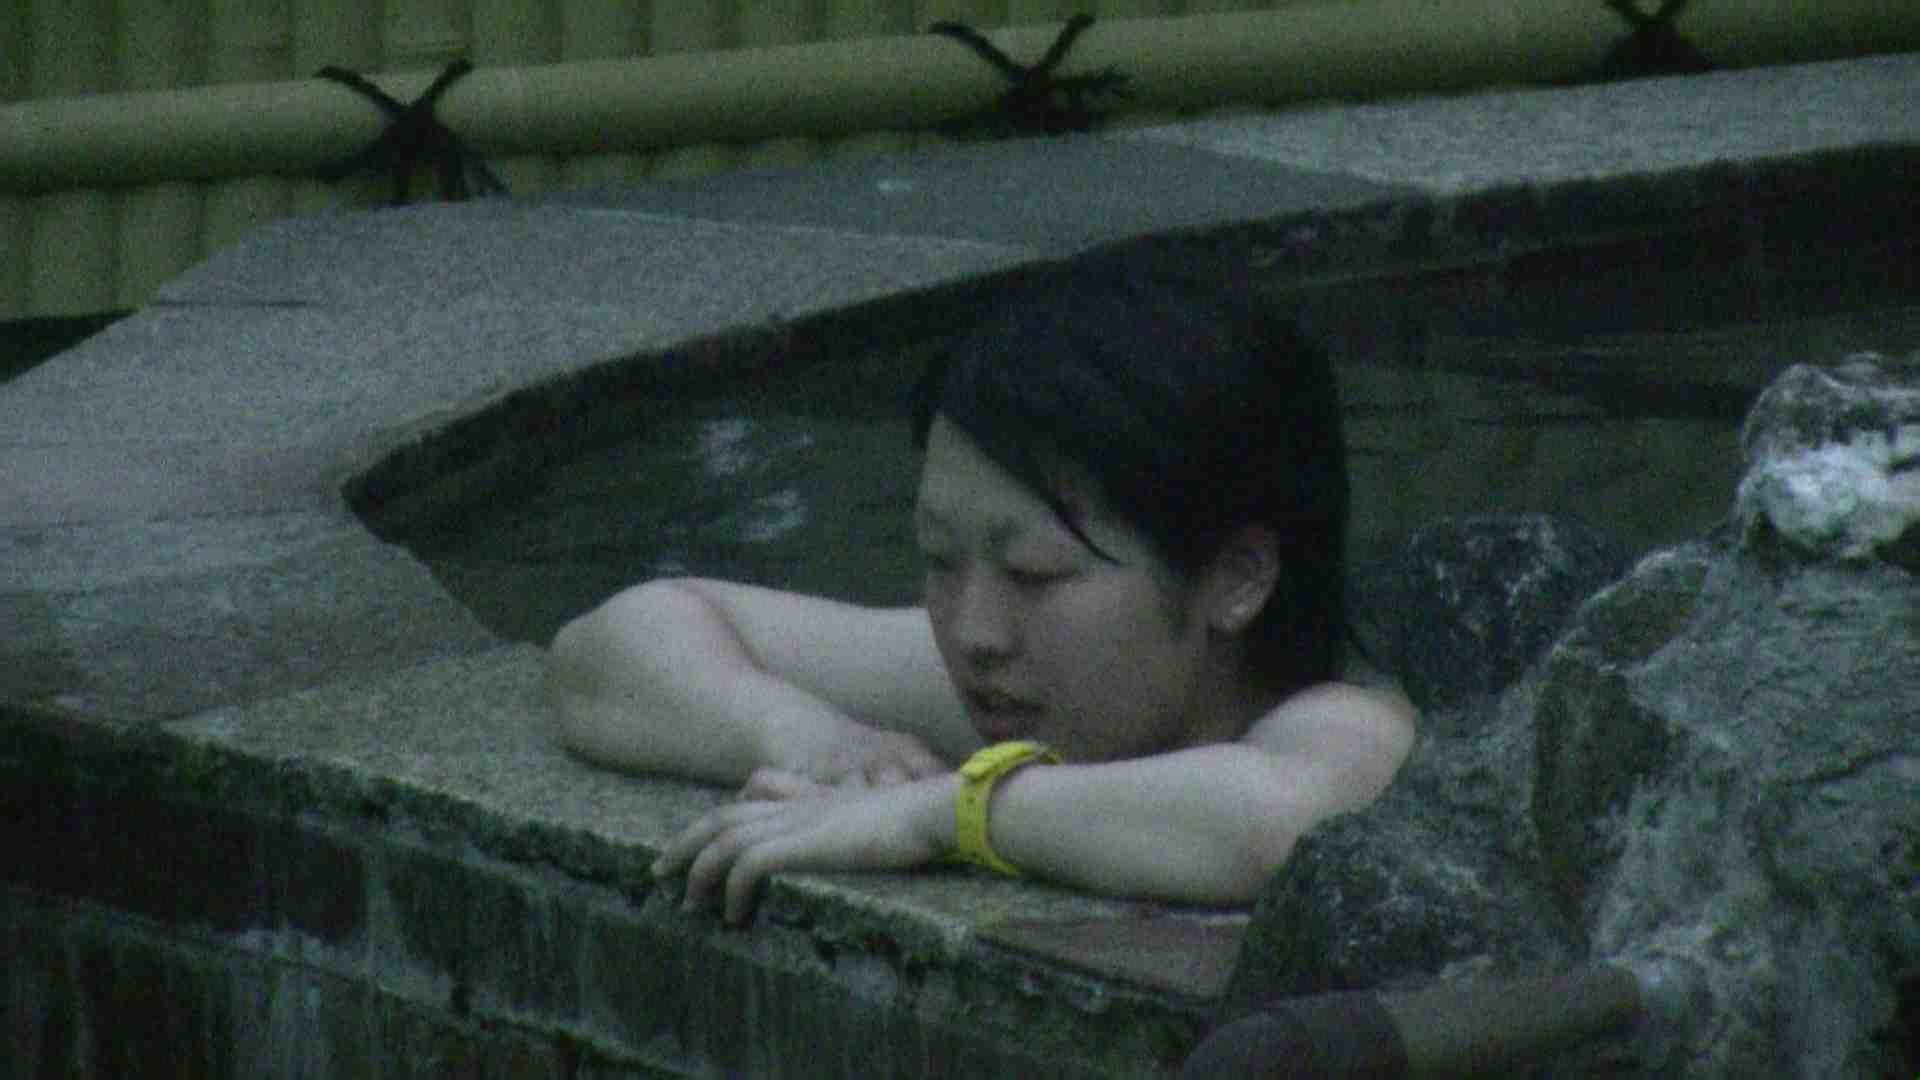 Aquaな露天風呂Vol.05【VIP】 綺麗なOLたち | 盗撮  63枚 55